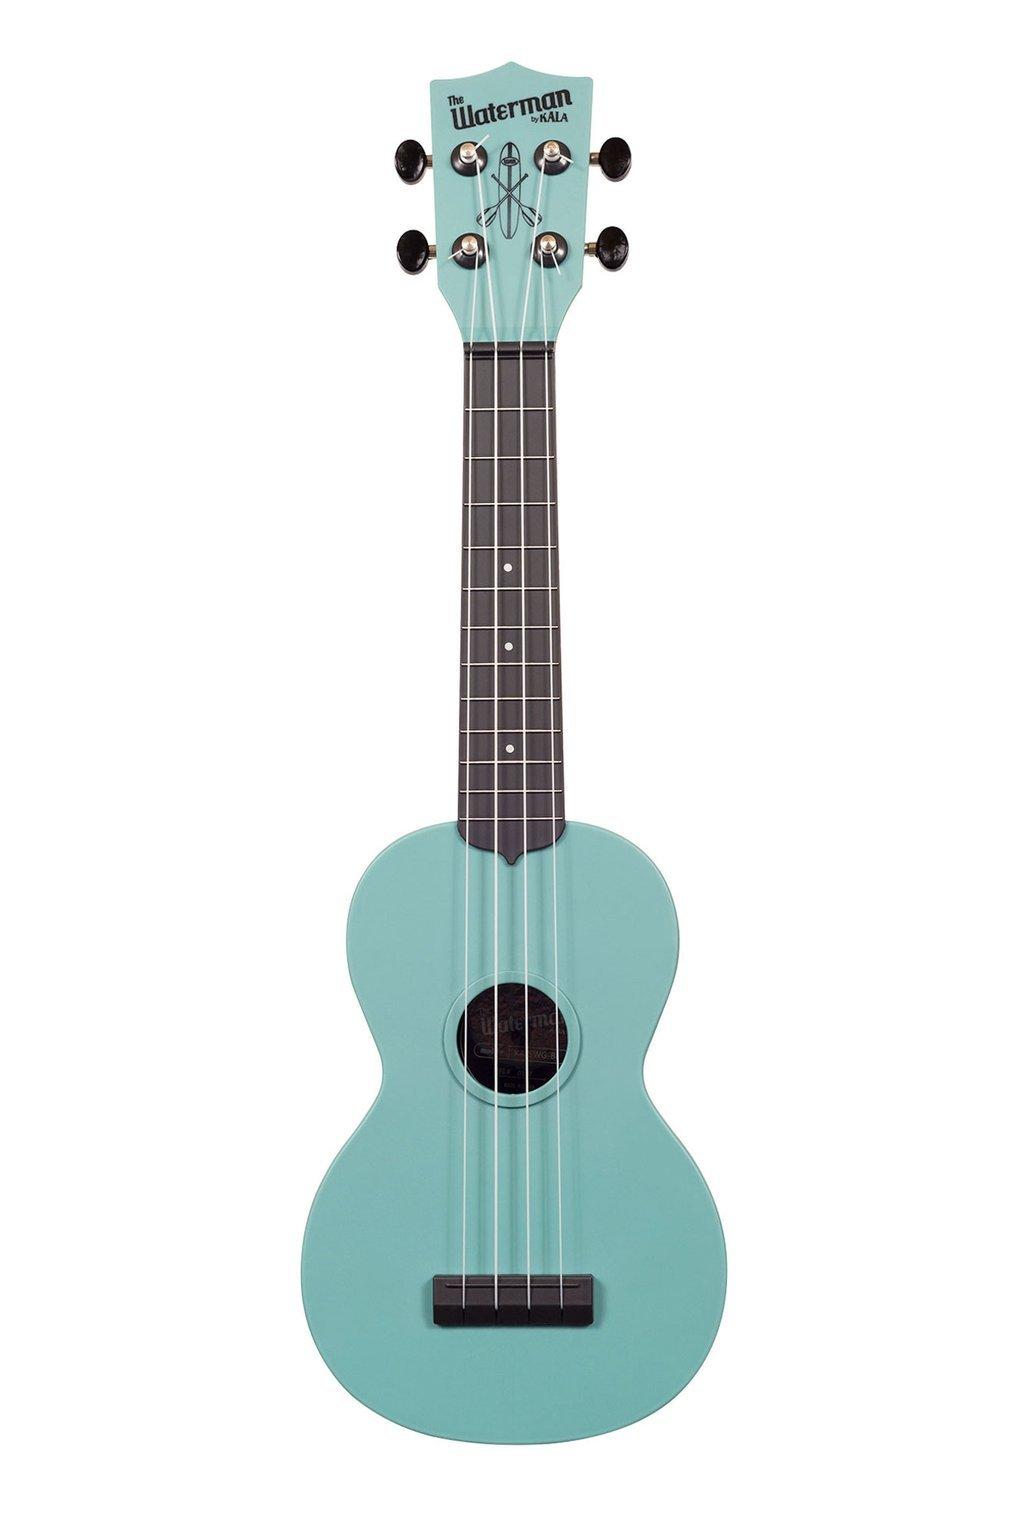 Waterman GITD Blue Soprano Ukul